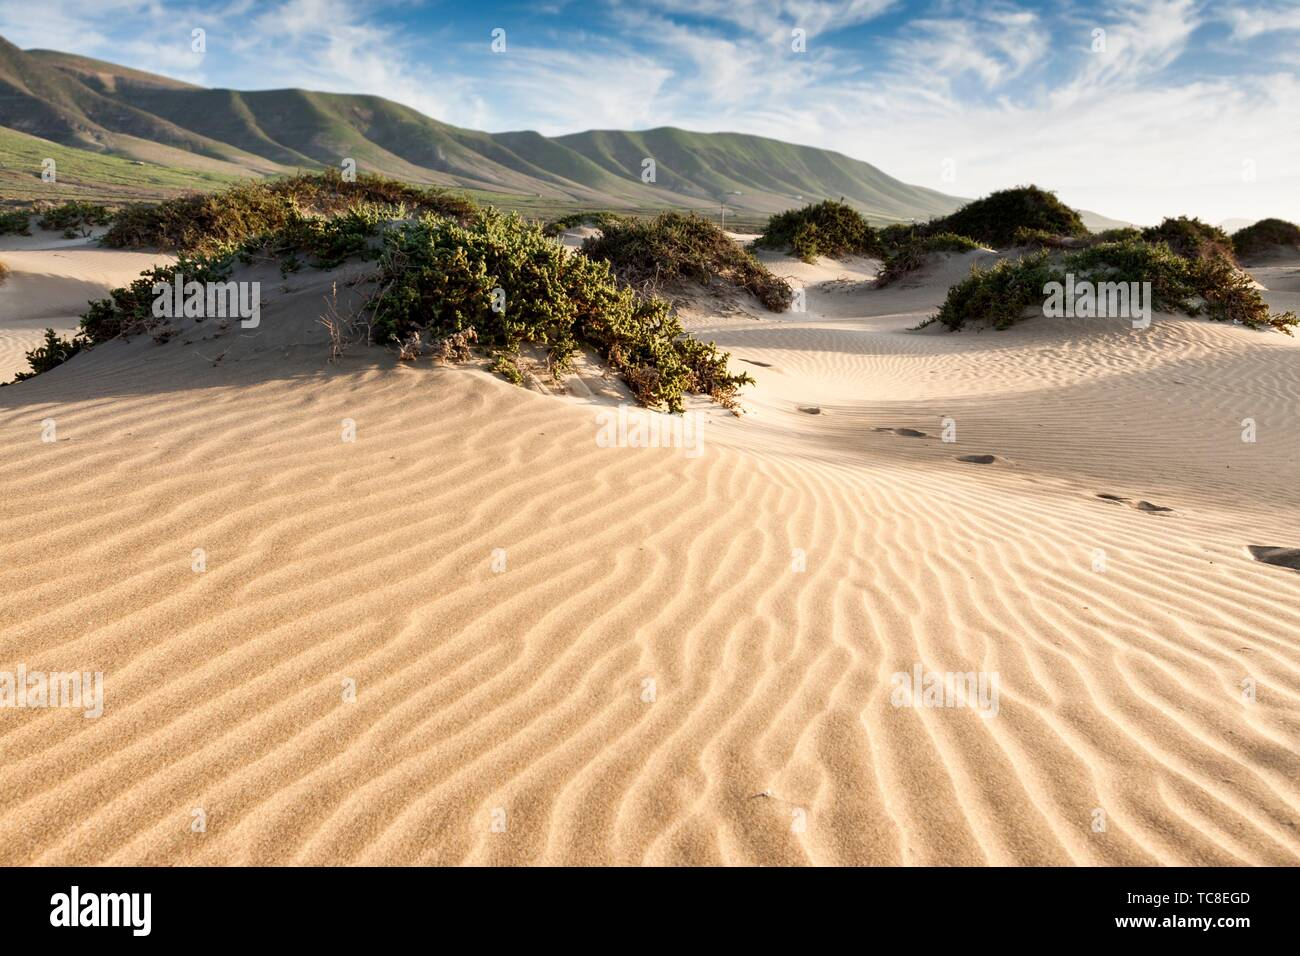 Dispose de dunes de sable de la baie. Famara, Lanzarote. L'Espagne. Banque D'Images